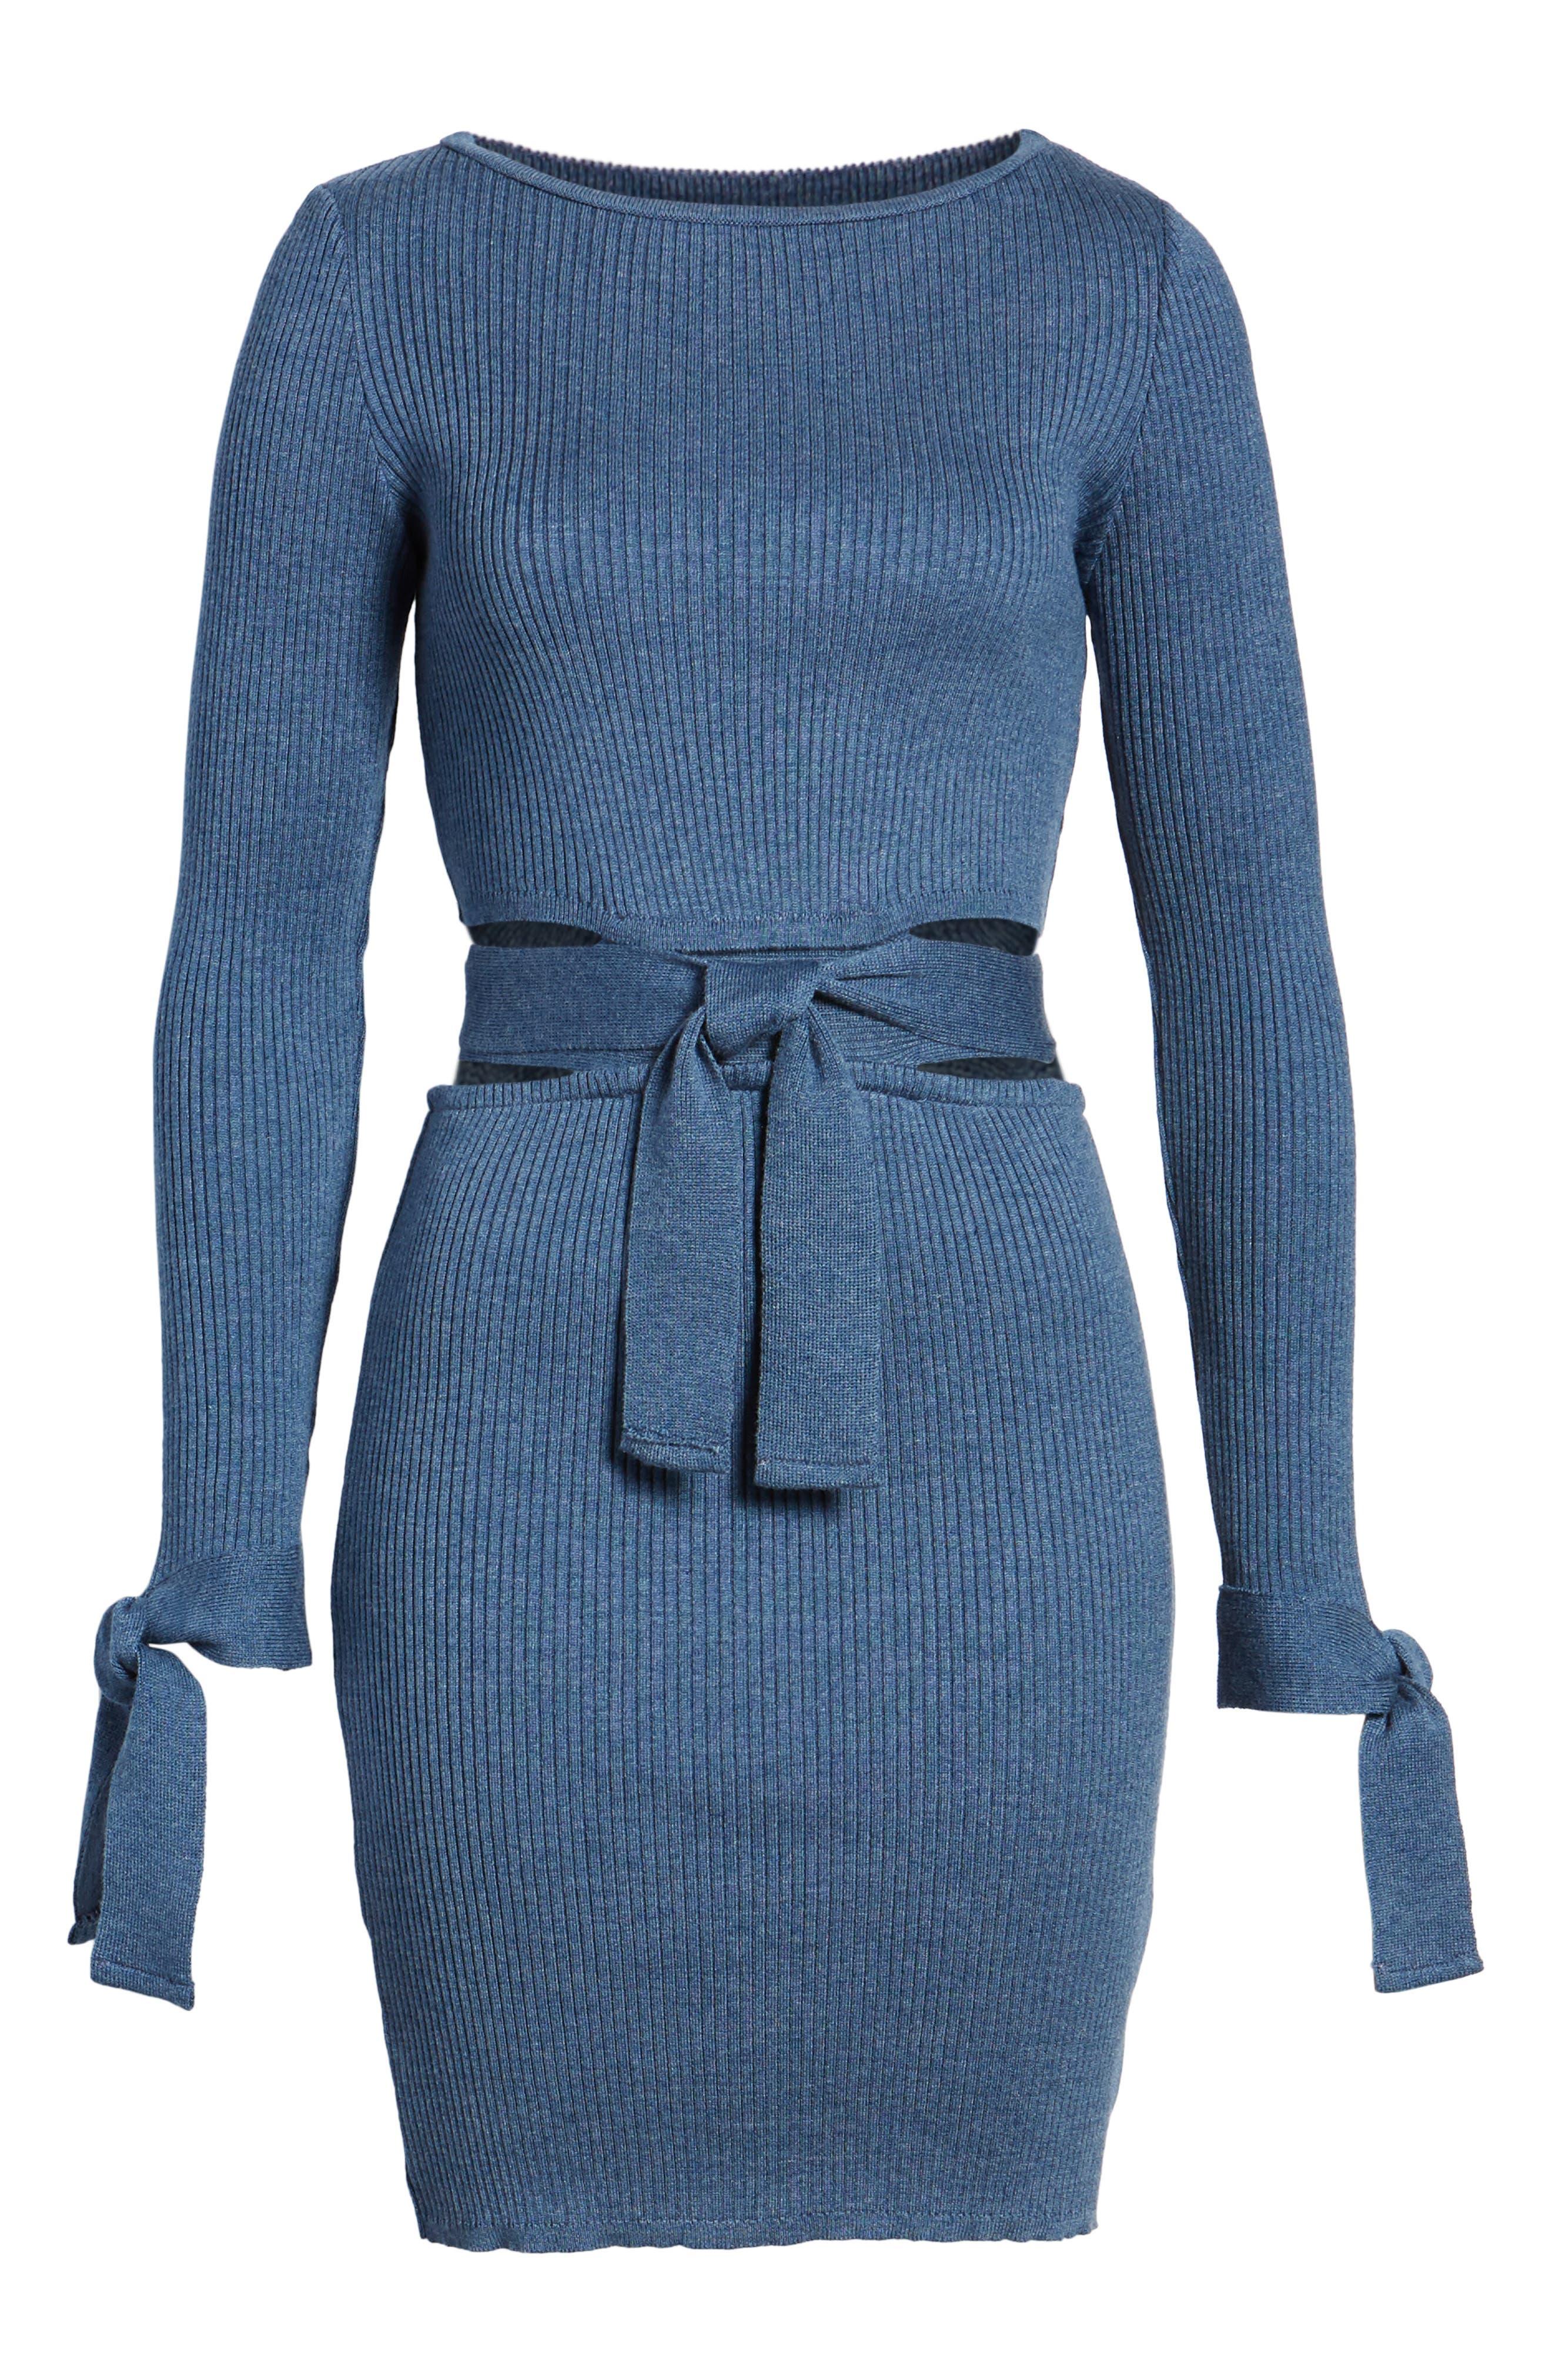 Cutout Body-Con Dress,                             Alternate thumbnail 8, color,                             Blue